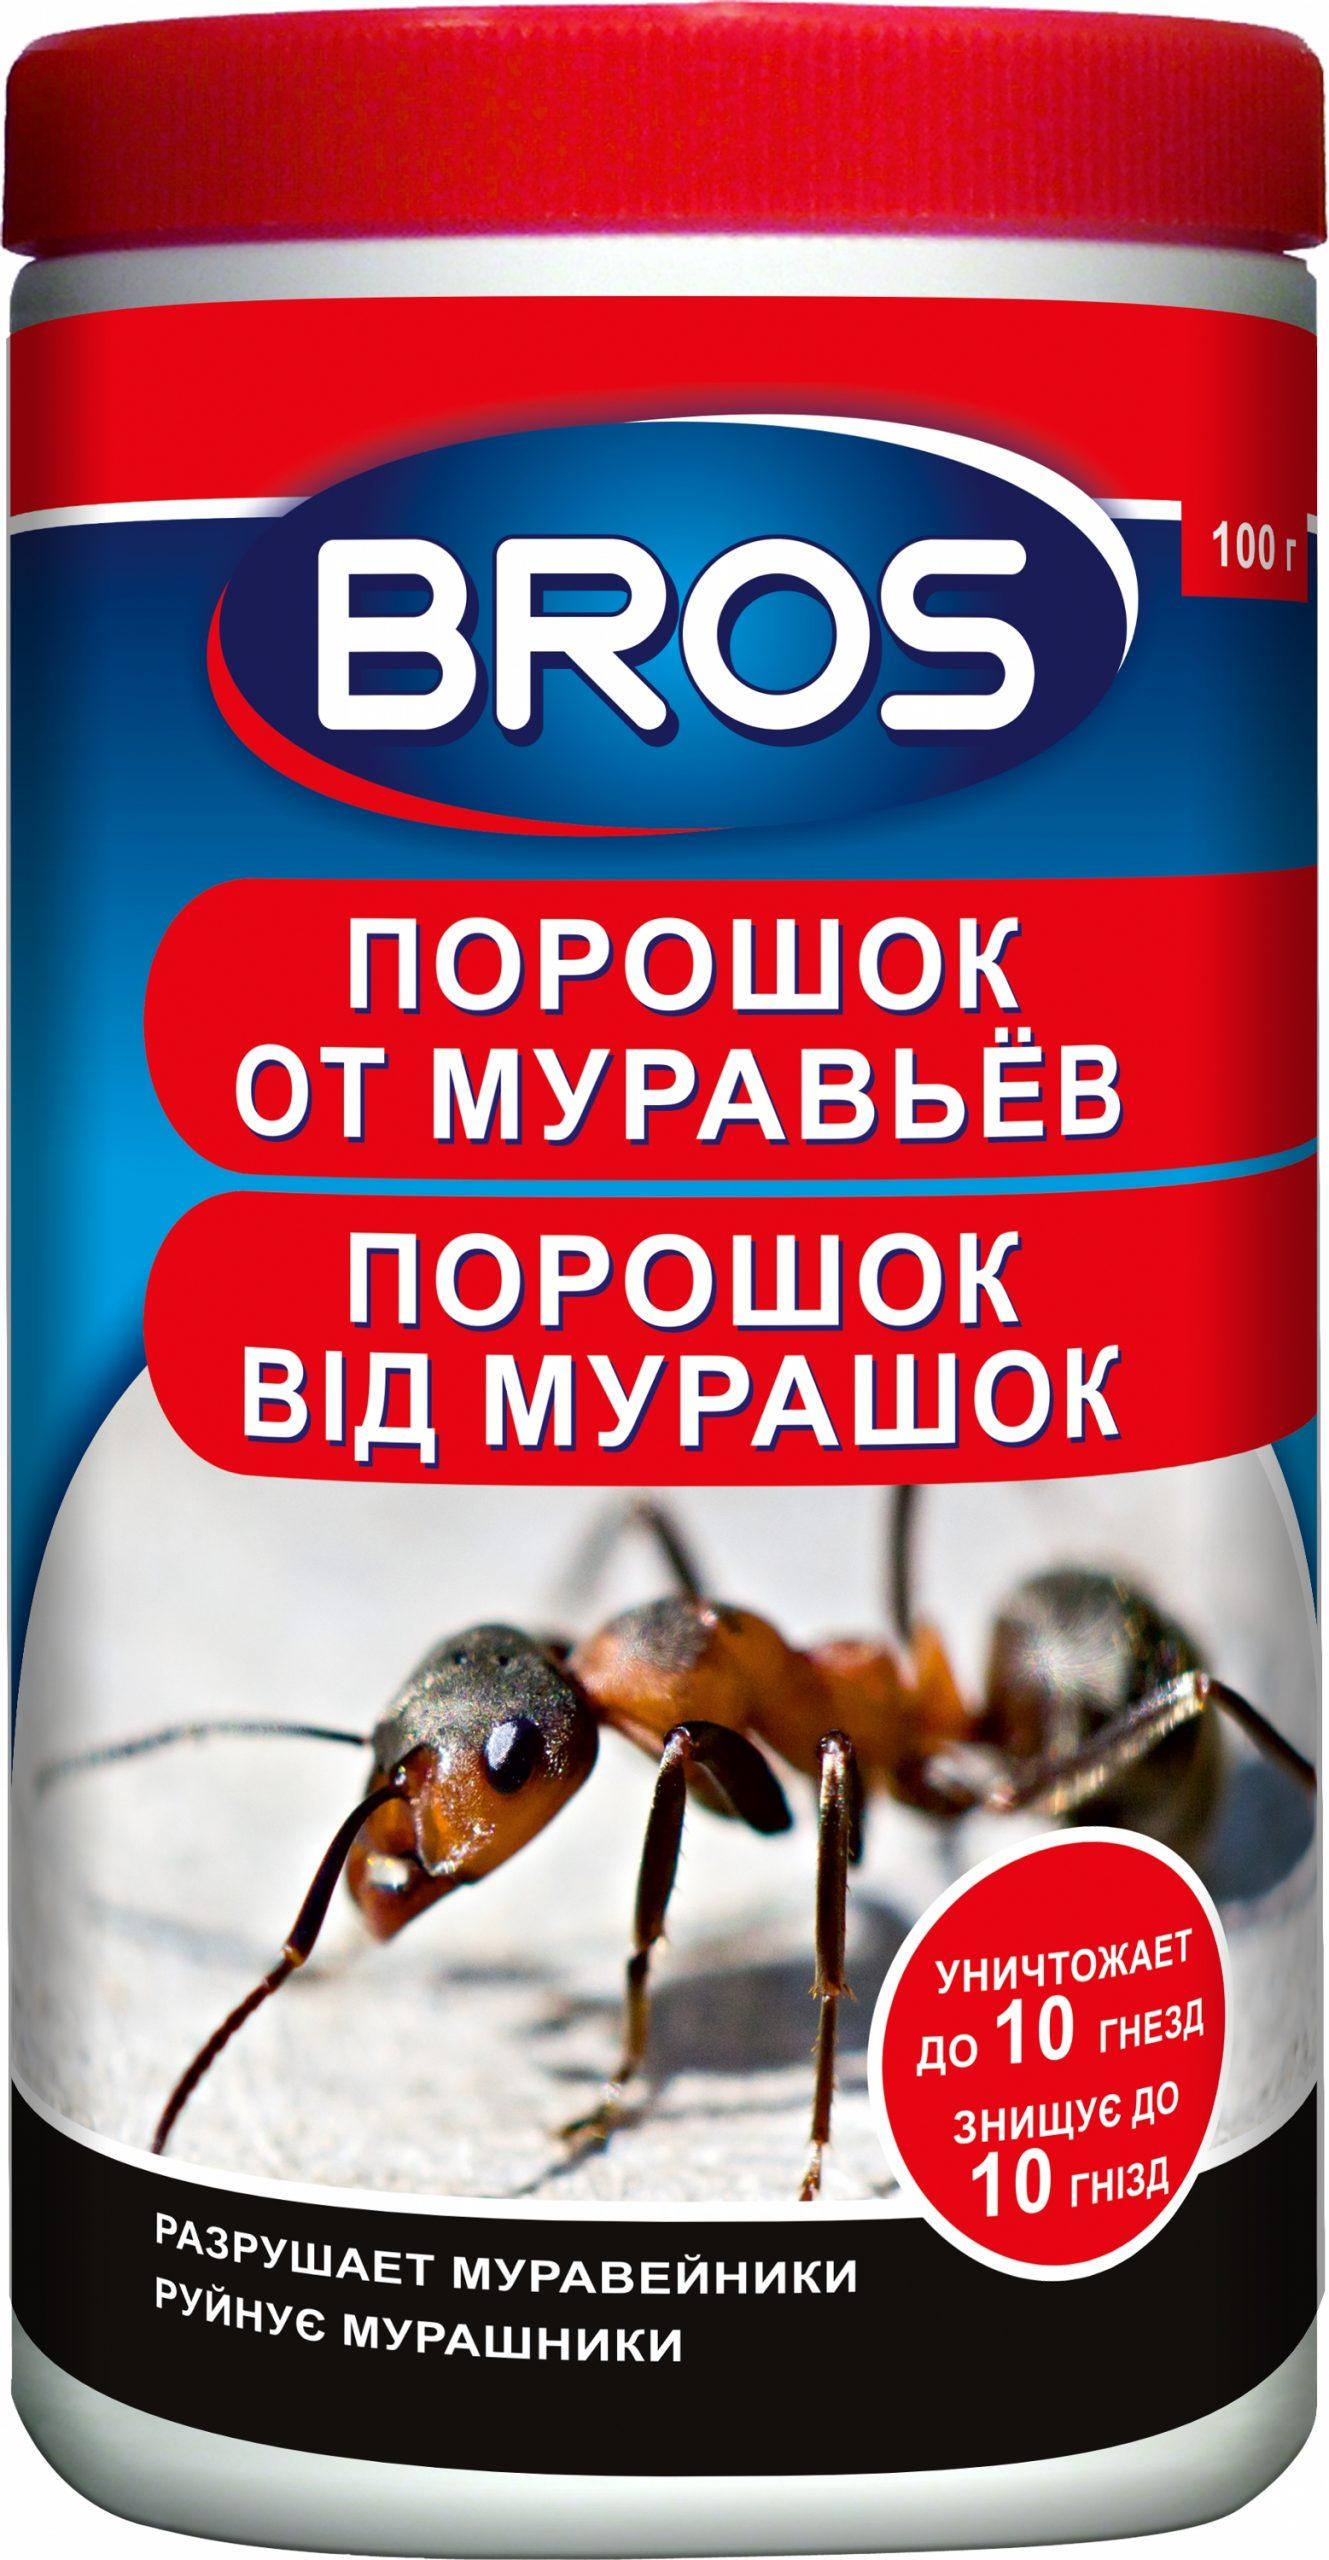 Poroshok Bros Ot Muravev